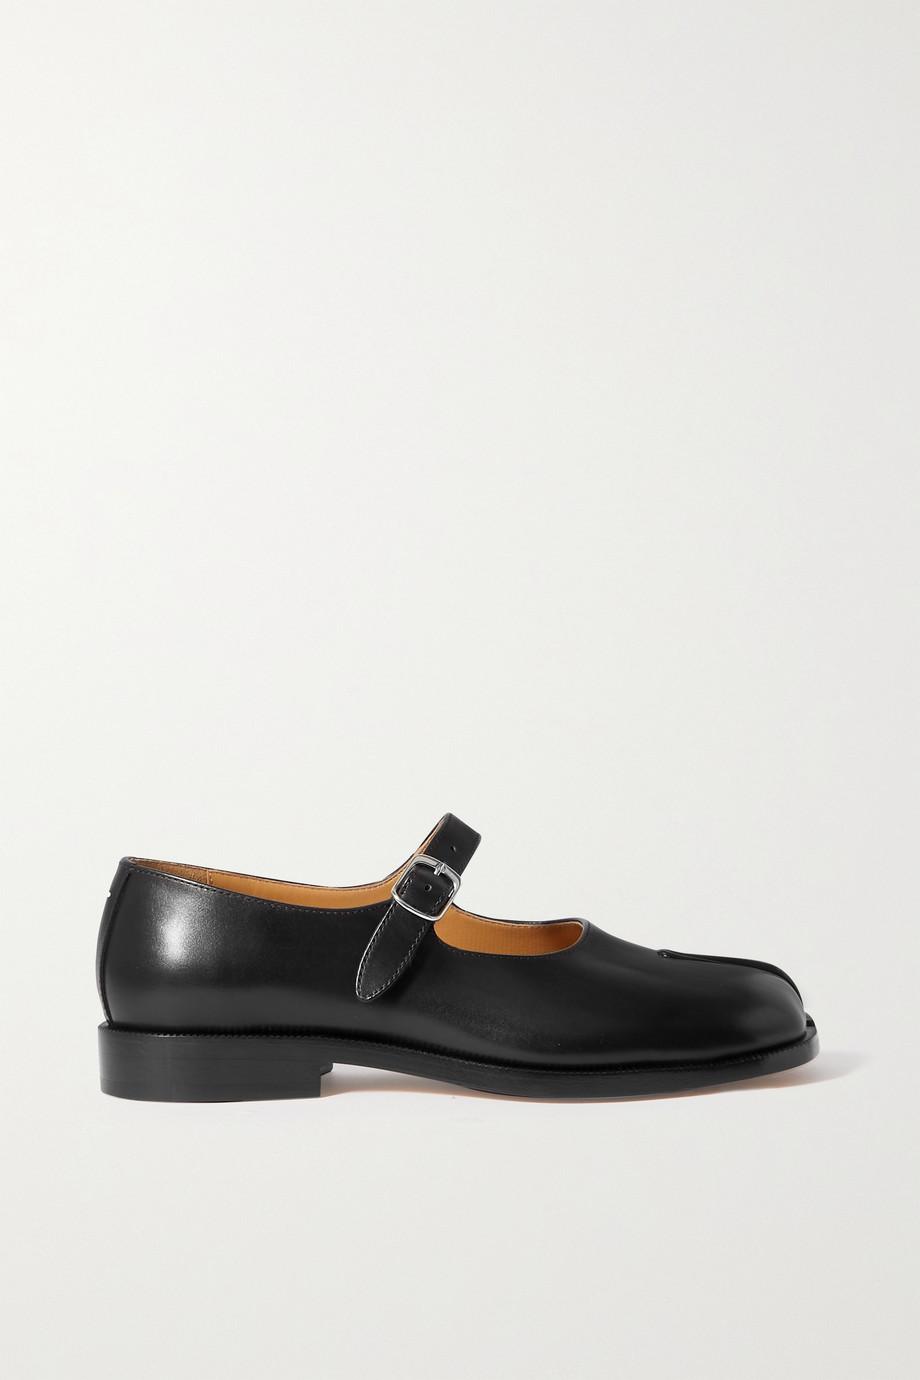 Maison Margiela Tabi split-toe leather flats